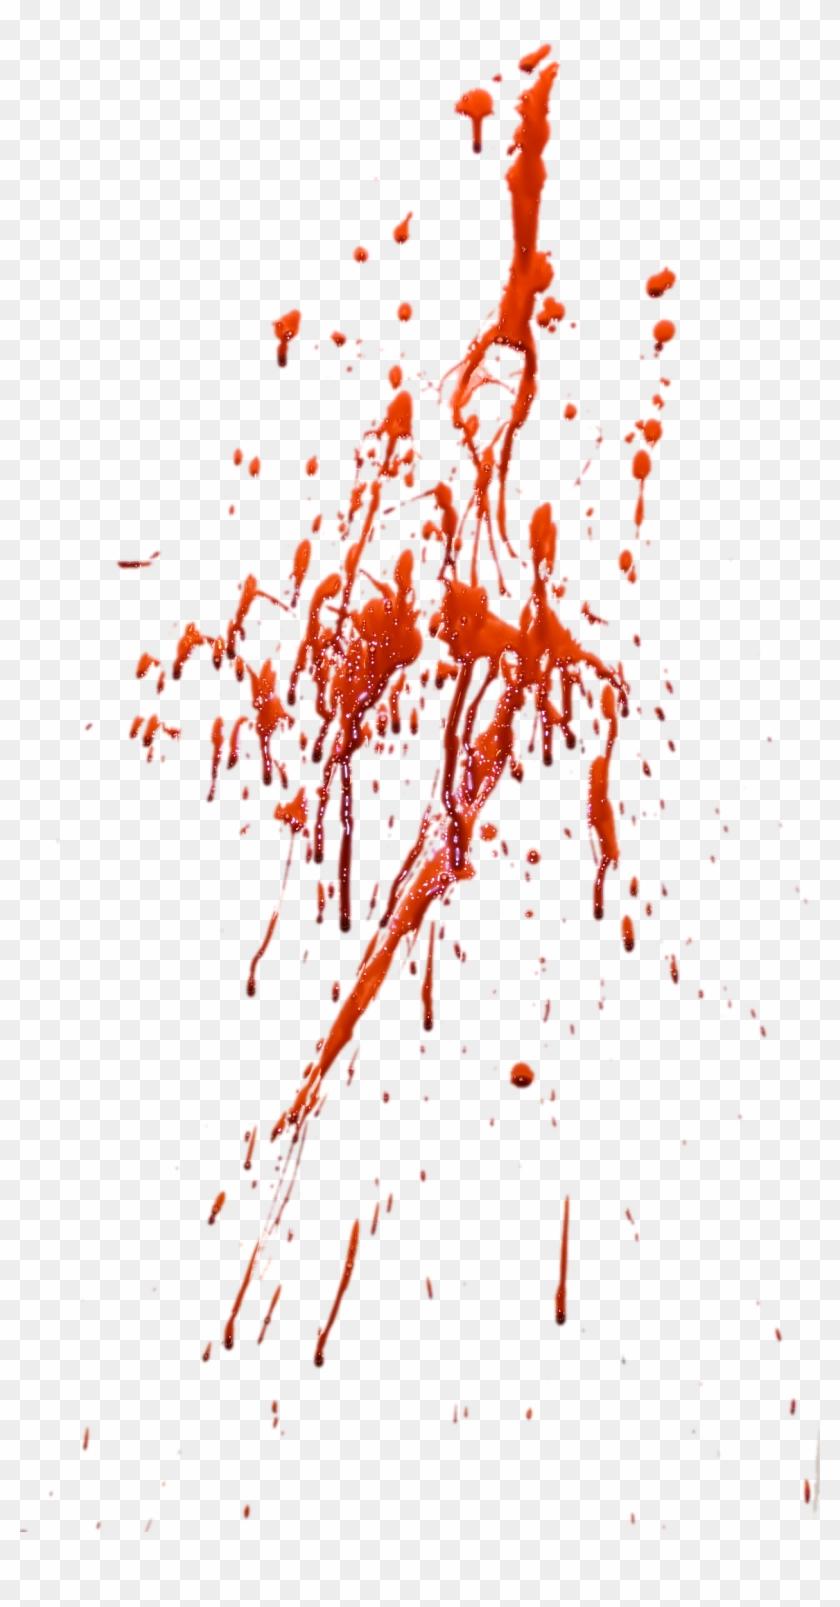 Blood Splat Png Png Blood Transparent Png 1246x2325 2720081 Pngfind